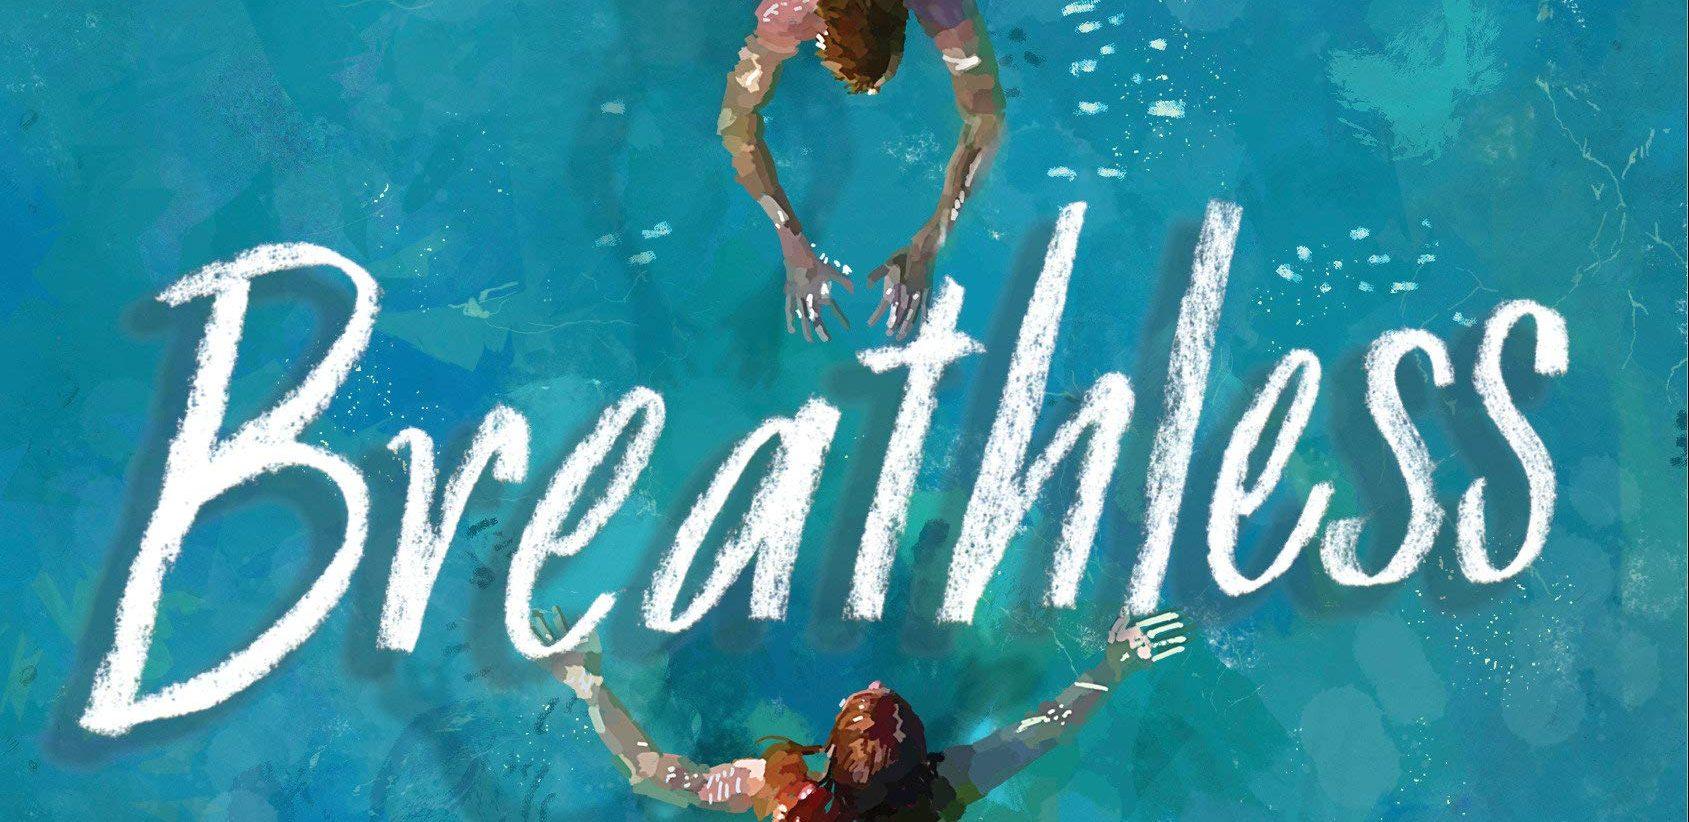 Breathless: A Charming yet Tragic Summer Read